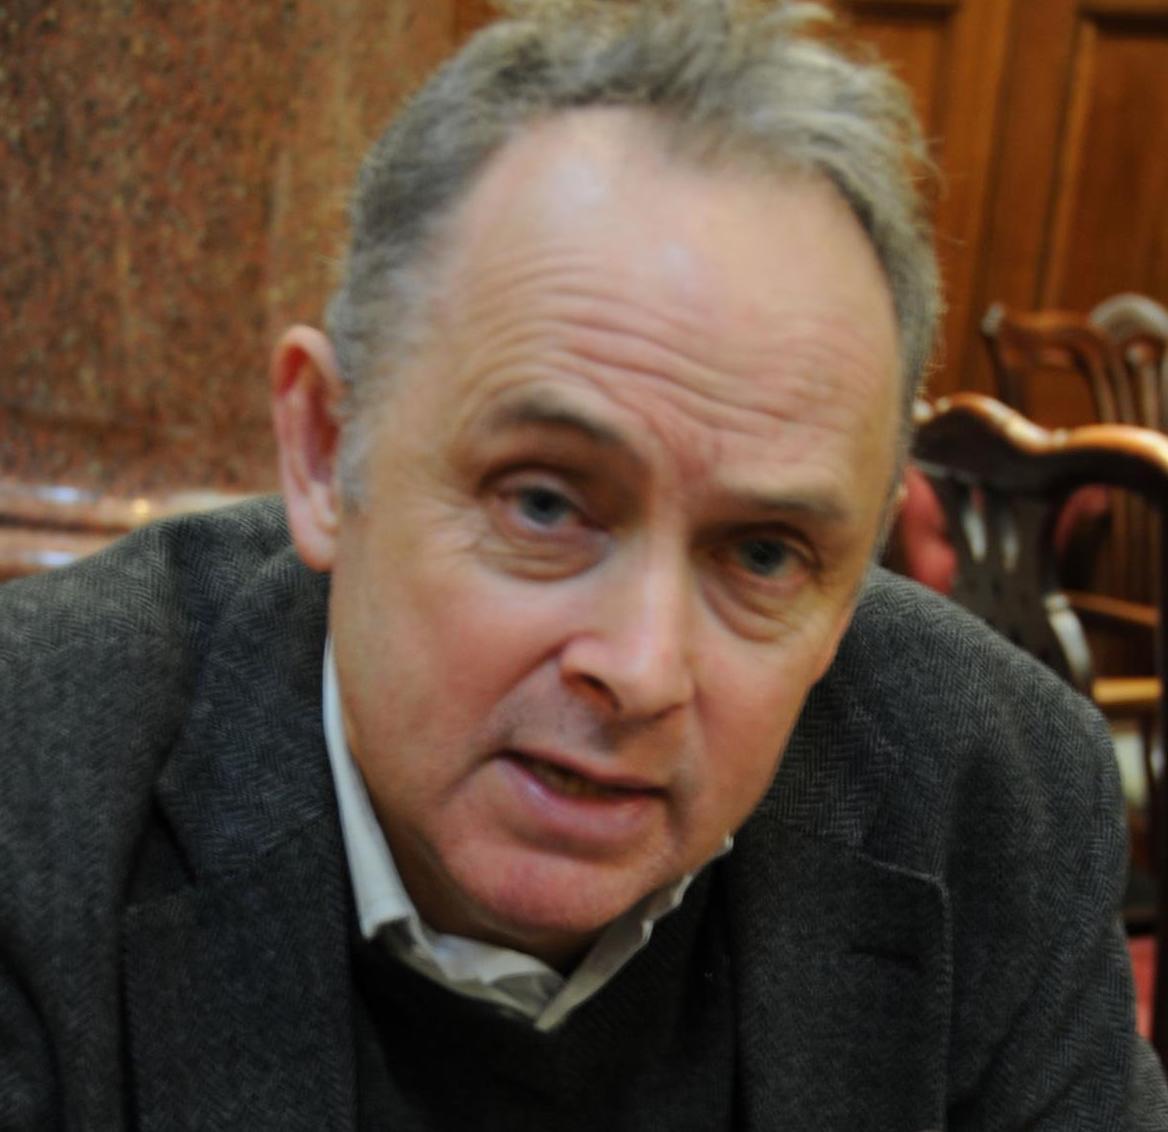 Guy Dehn